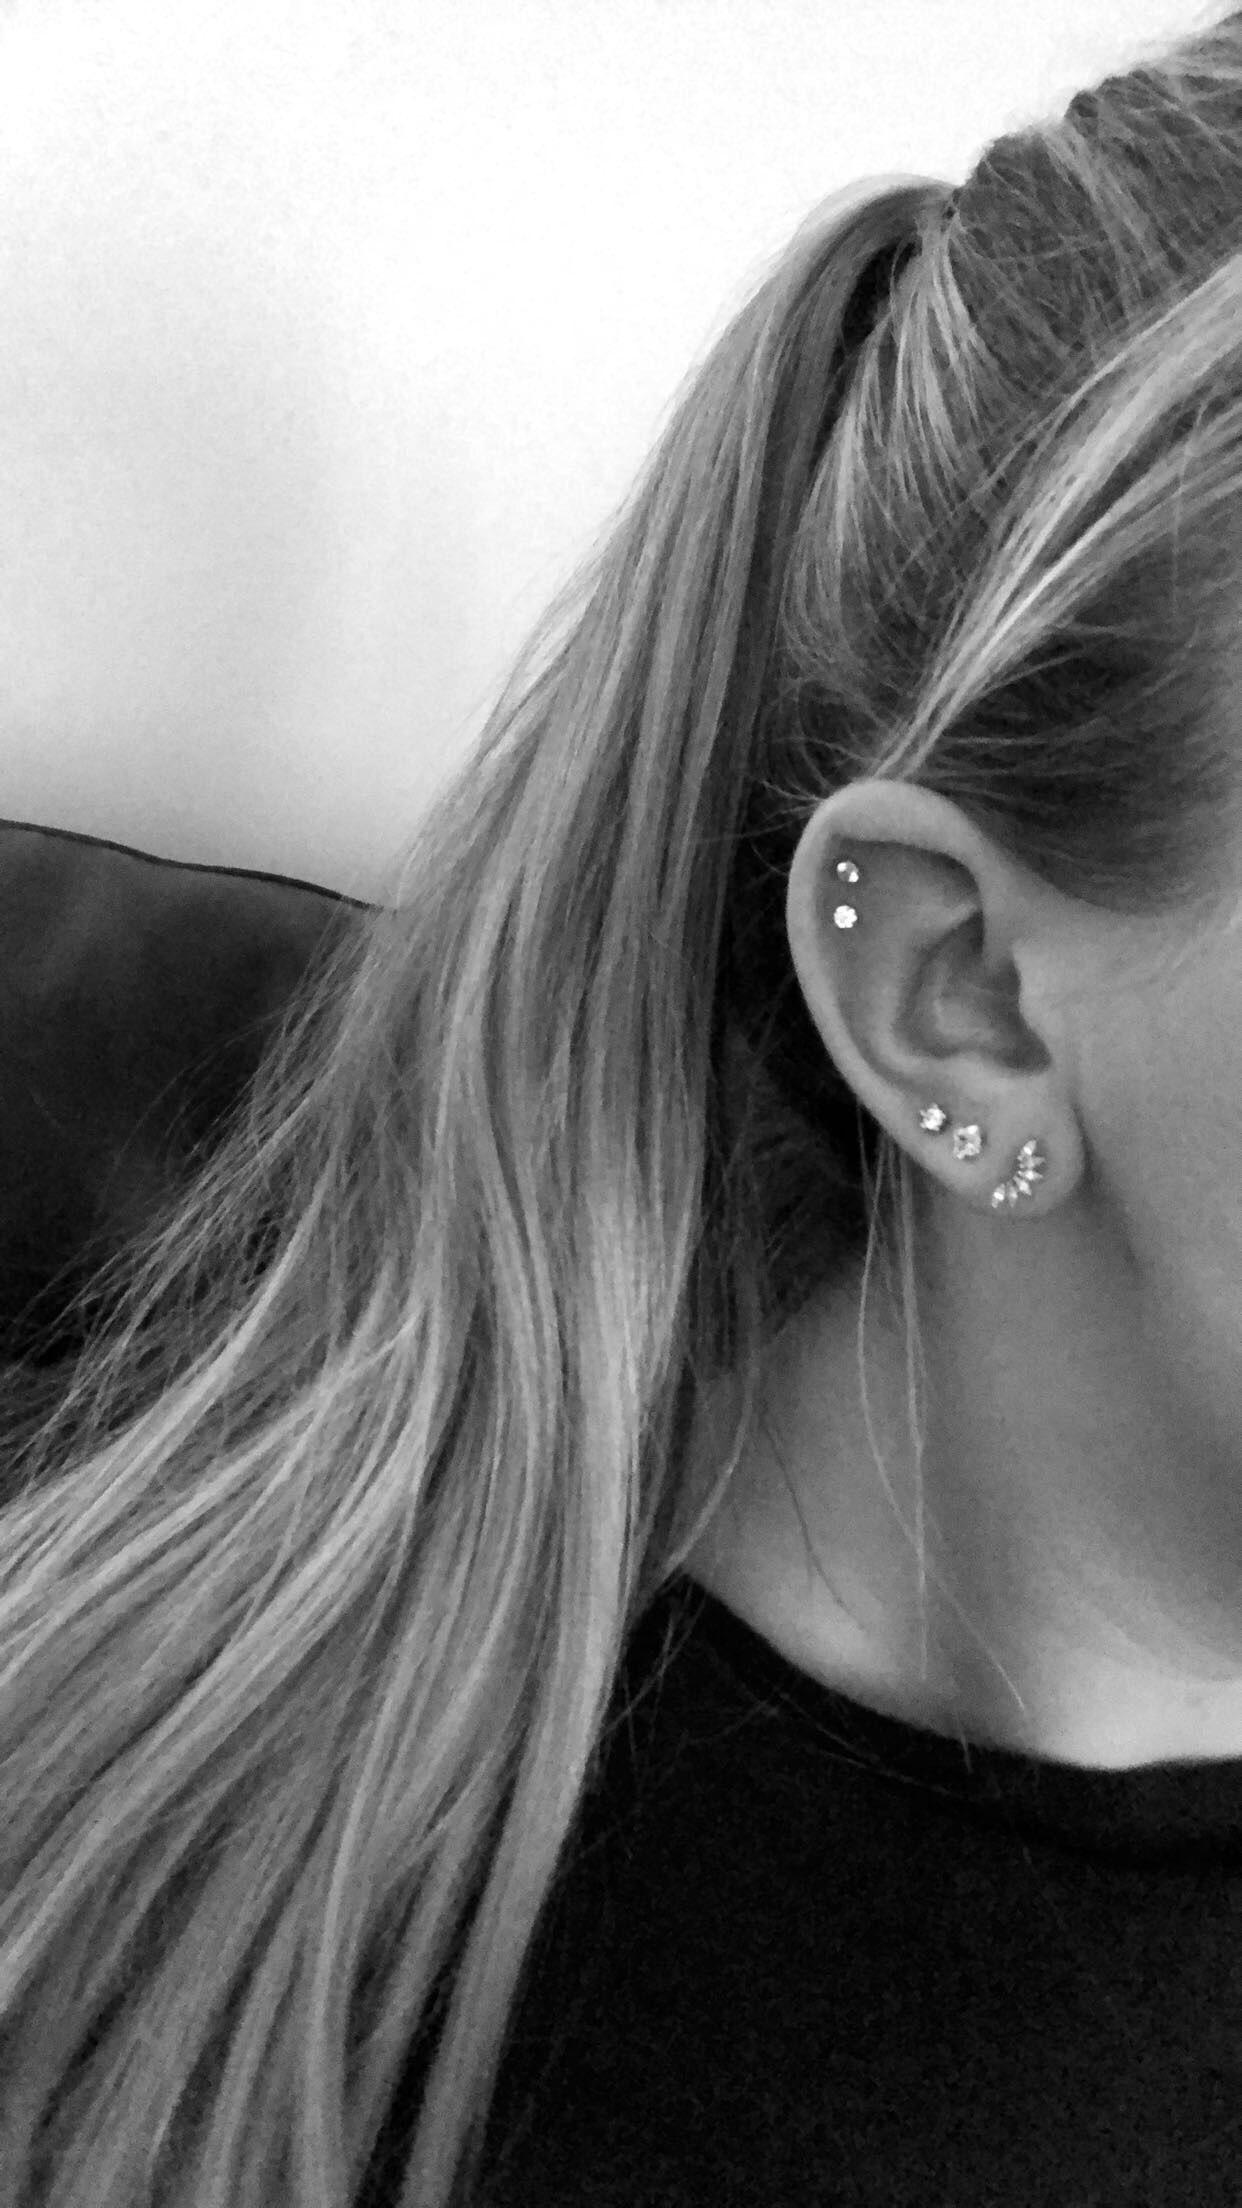 Ariana Grande Ear Piercings : ariana, grande, piercings, Piercing, Piercings,, Earings, Piercings